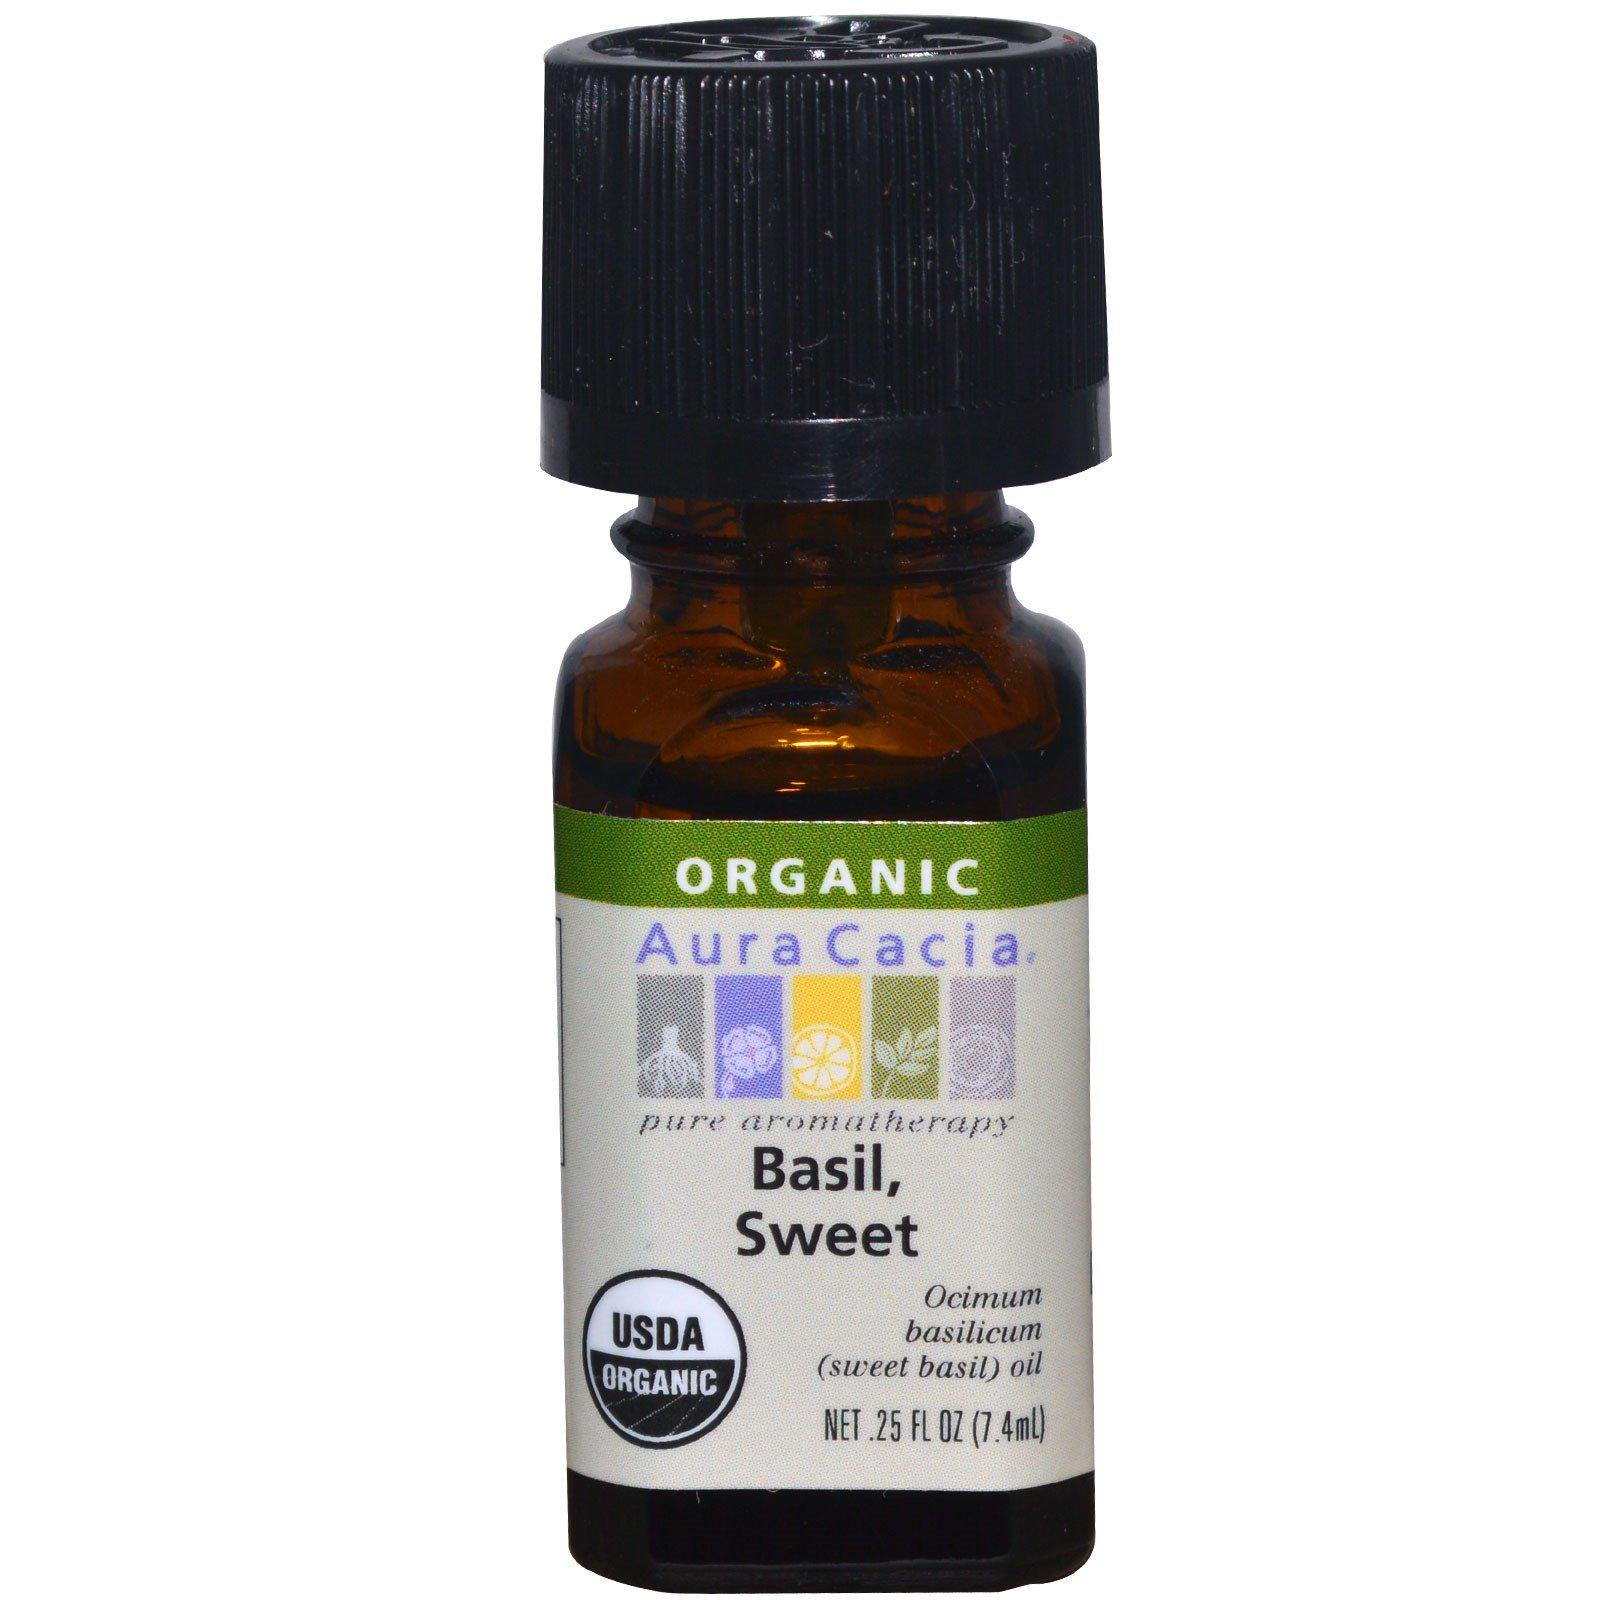 Aura Cacia Organic Basil Sweet 25 Fl Oz 7 4 Ml Iherb